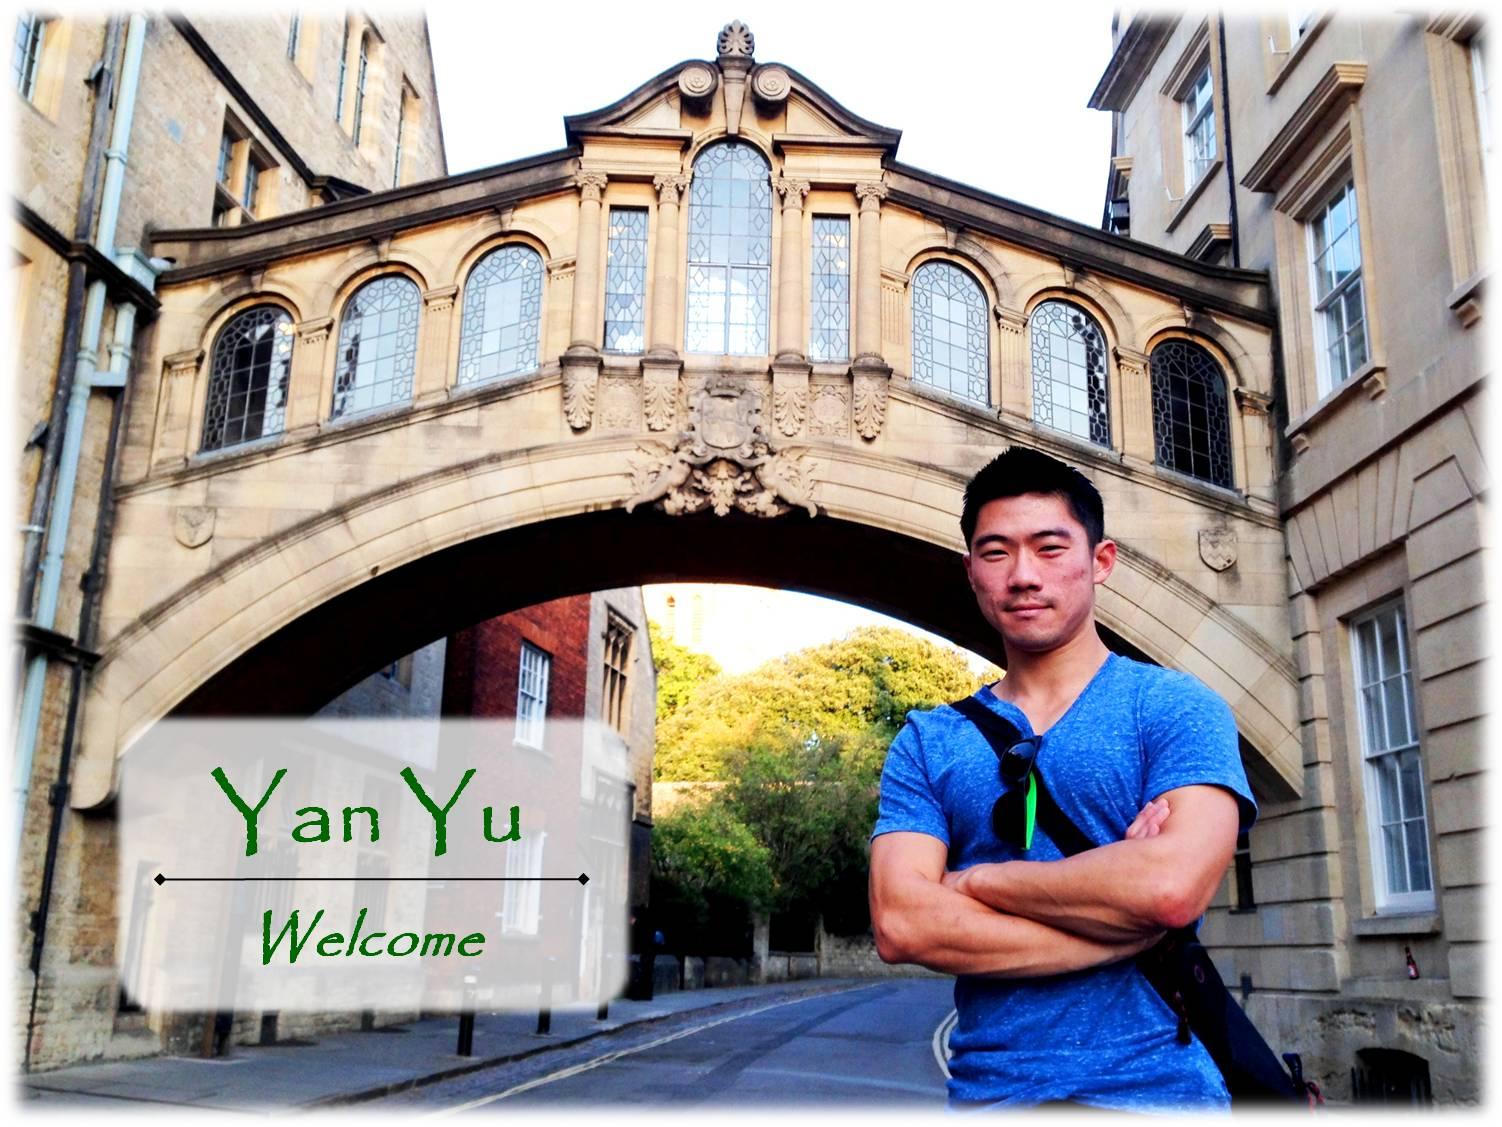 Welcome to Yan Yu